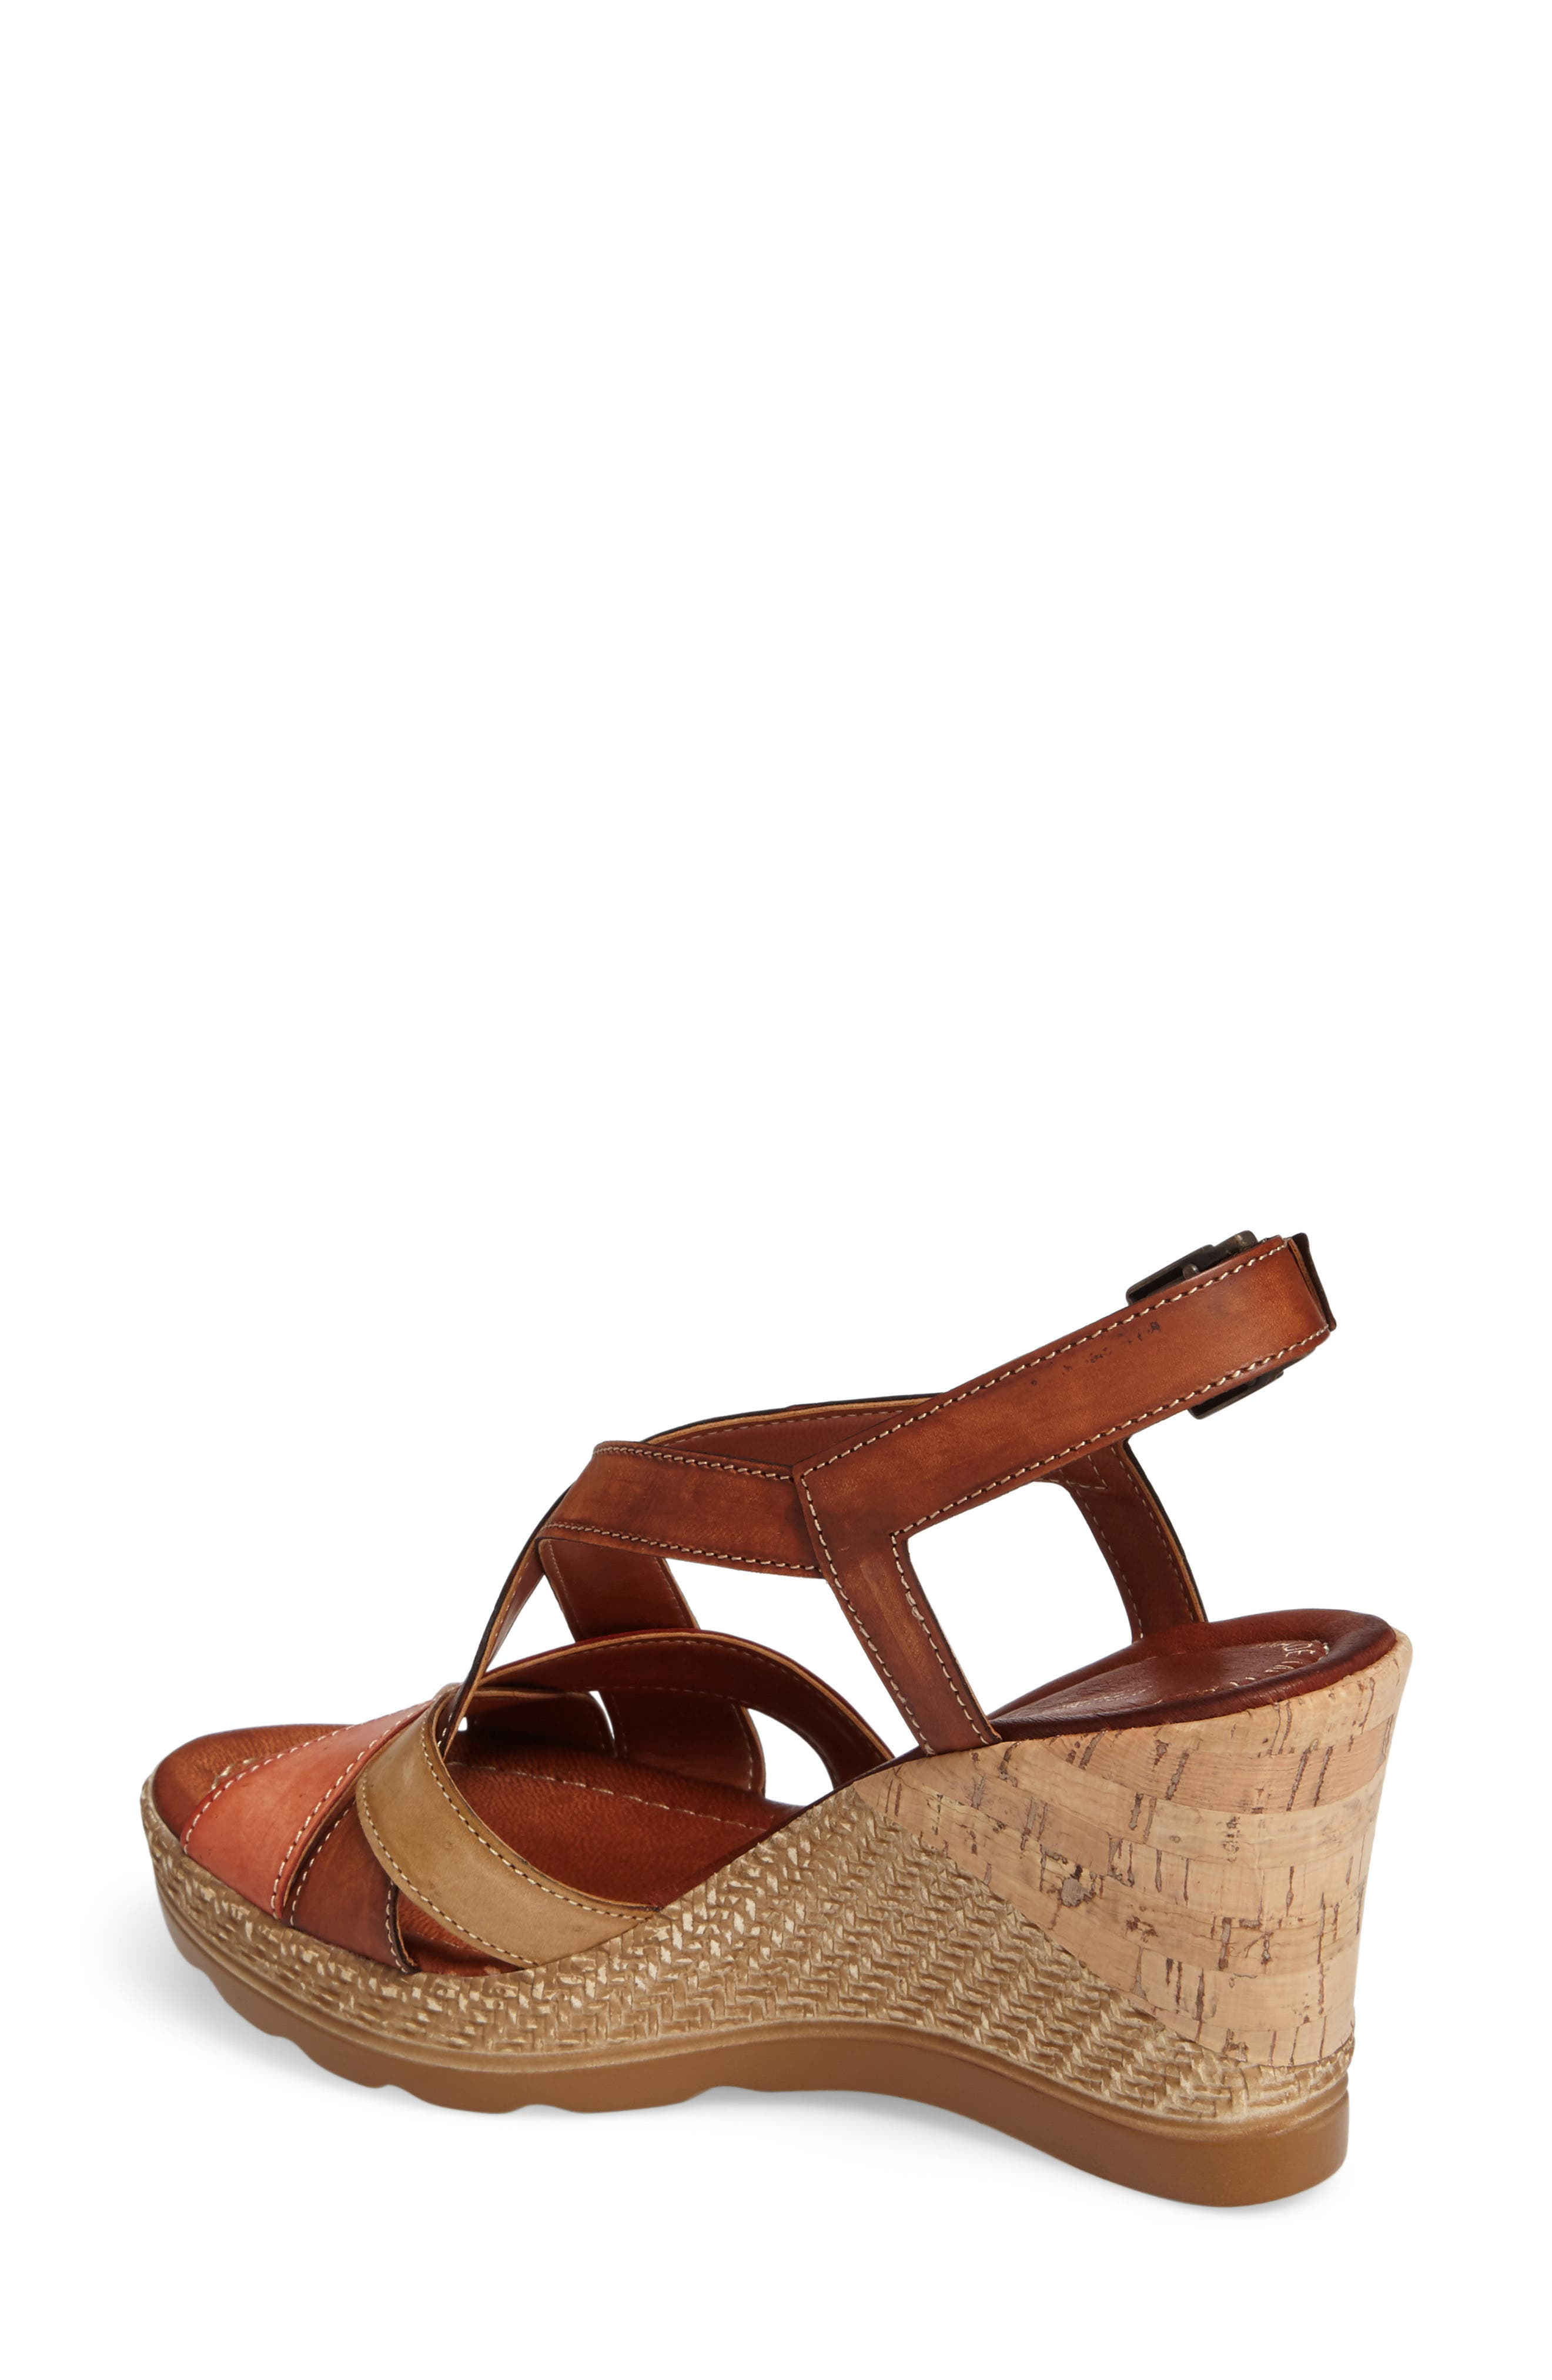 Modena Wedge Sandal,                             Alternate thumbnail 2, color,                             Cognac Leather